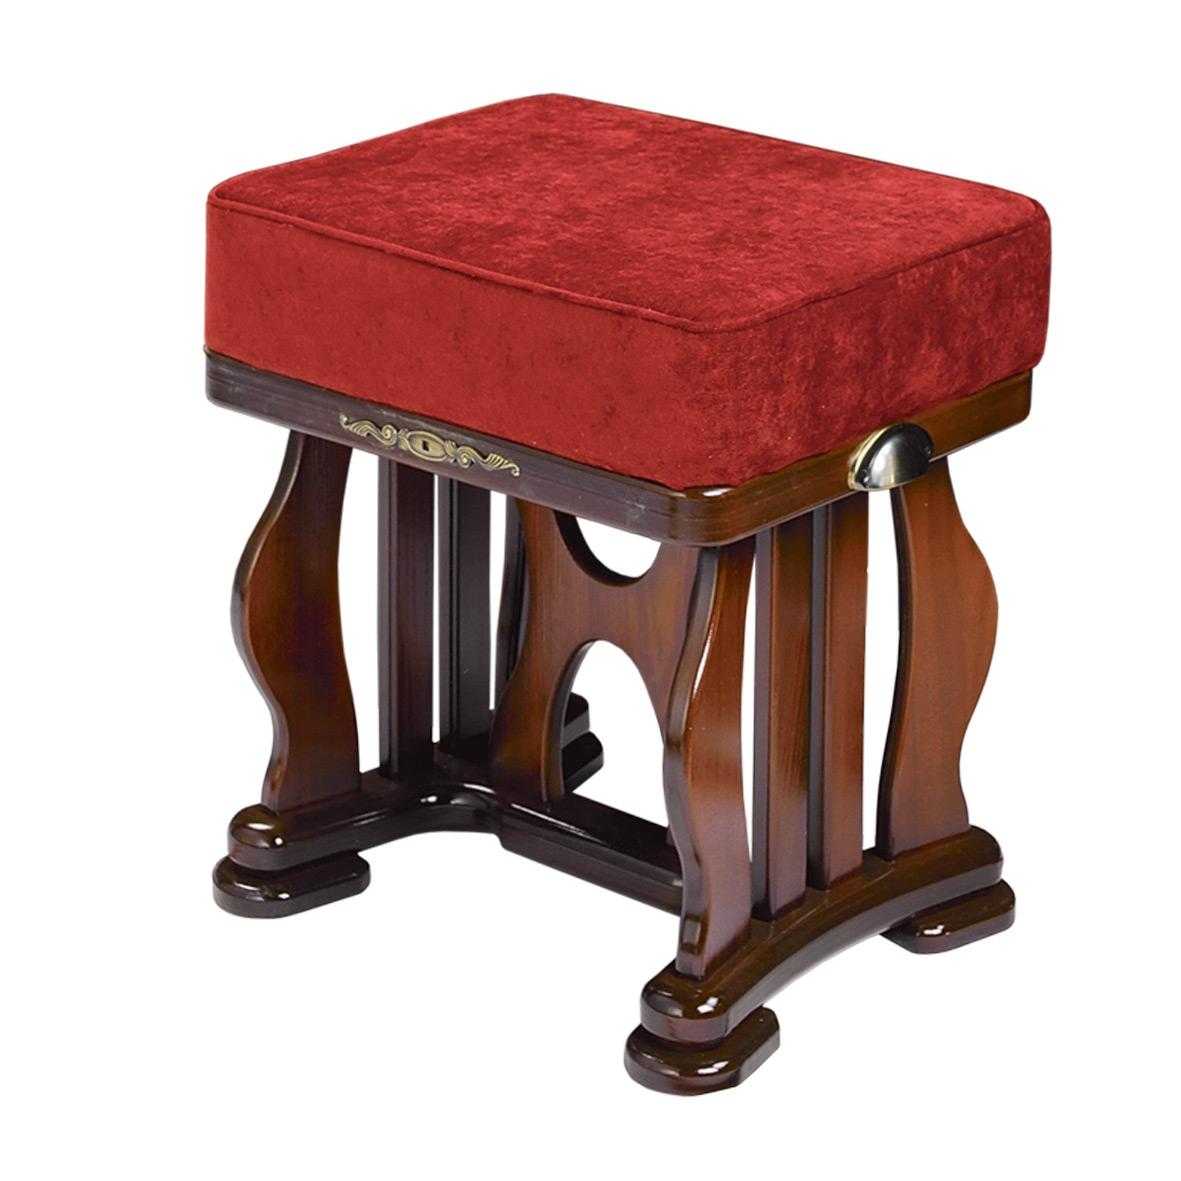 Банкетка «Джульетта» цвет Орех, тк.Бурый - 5910